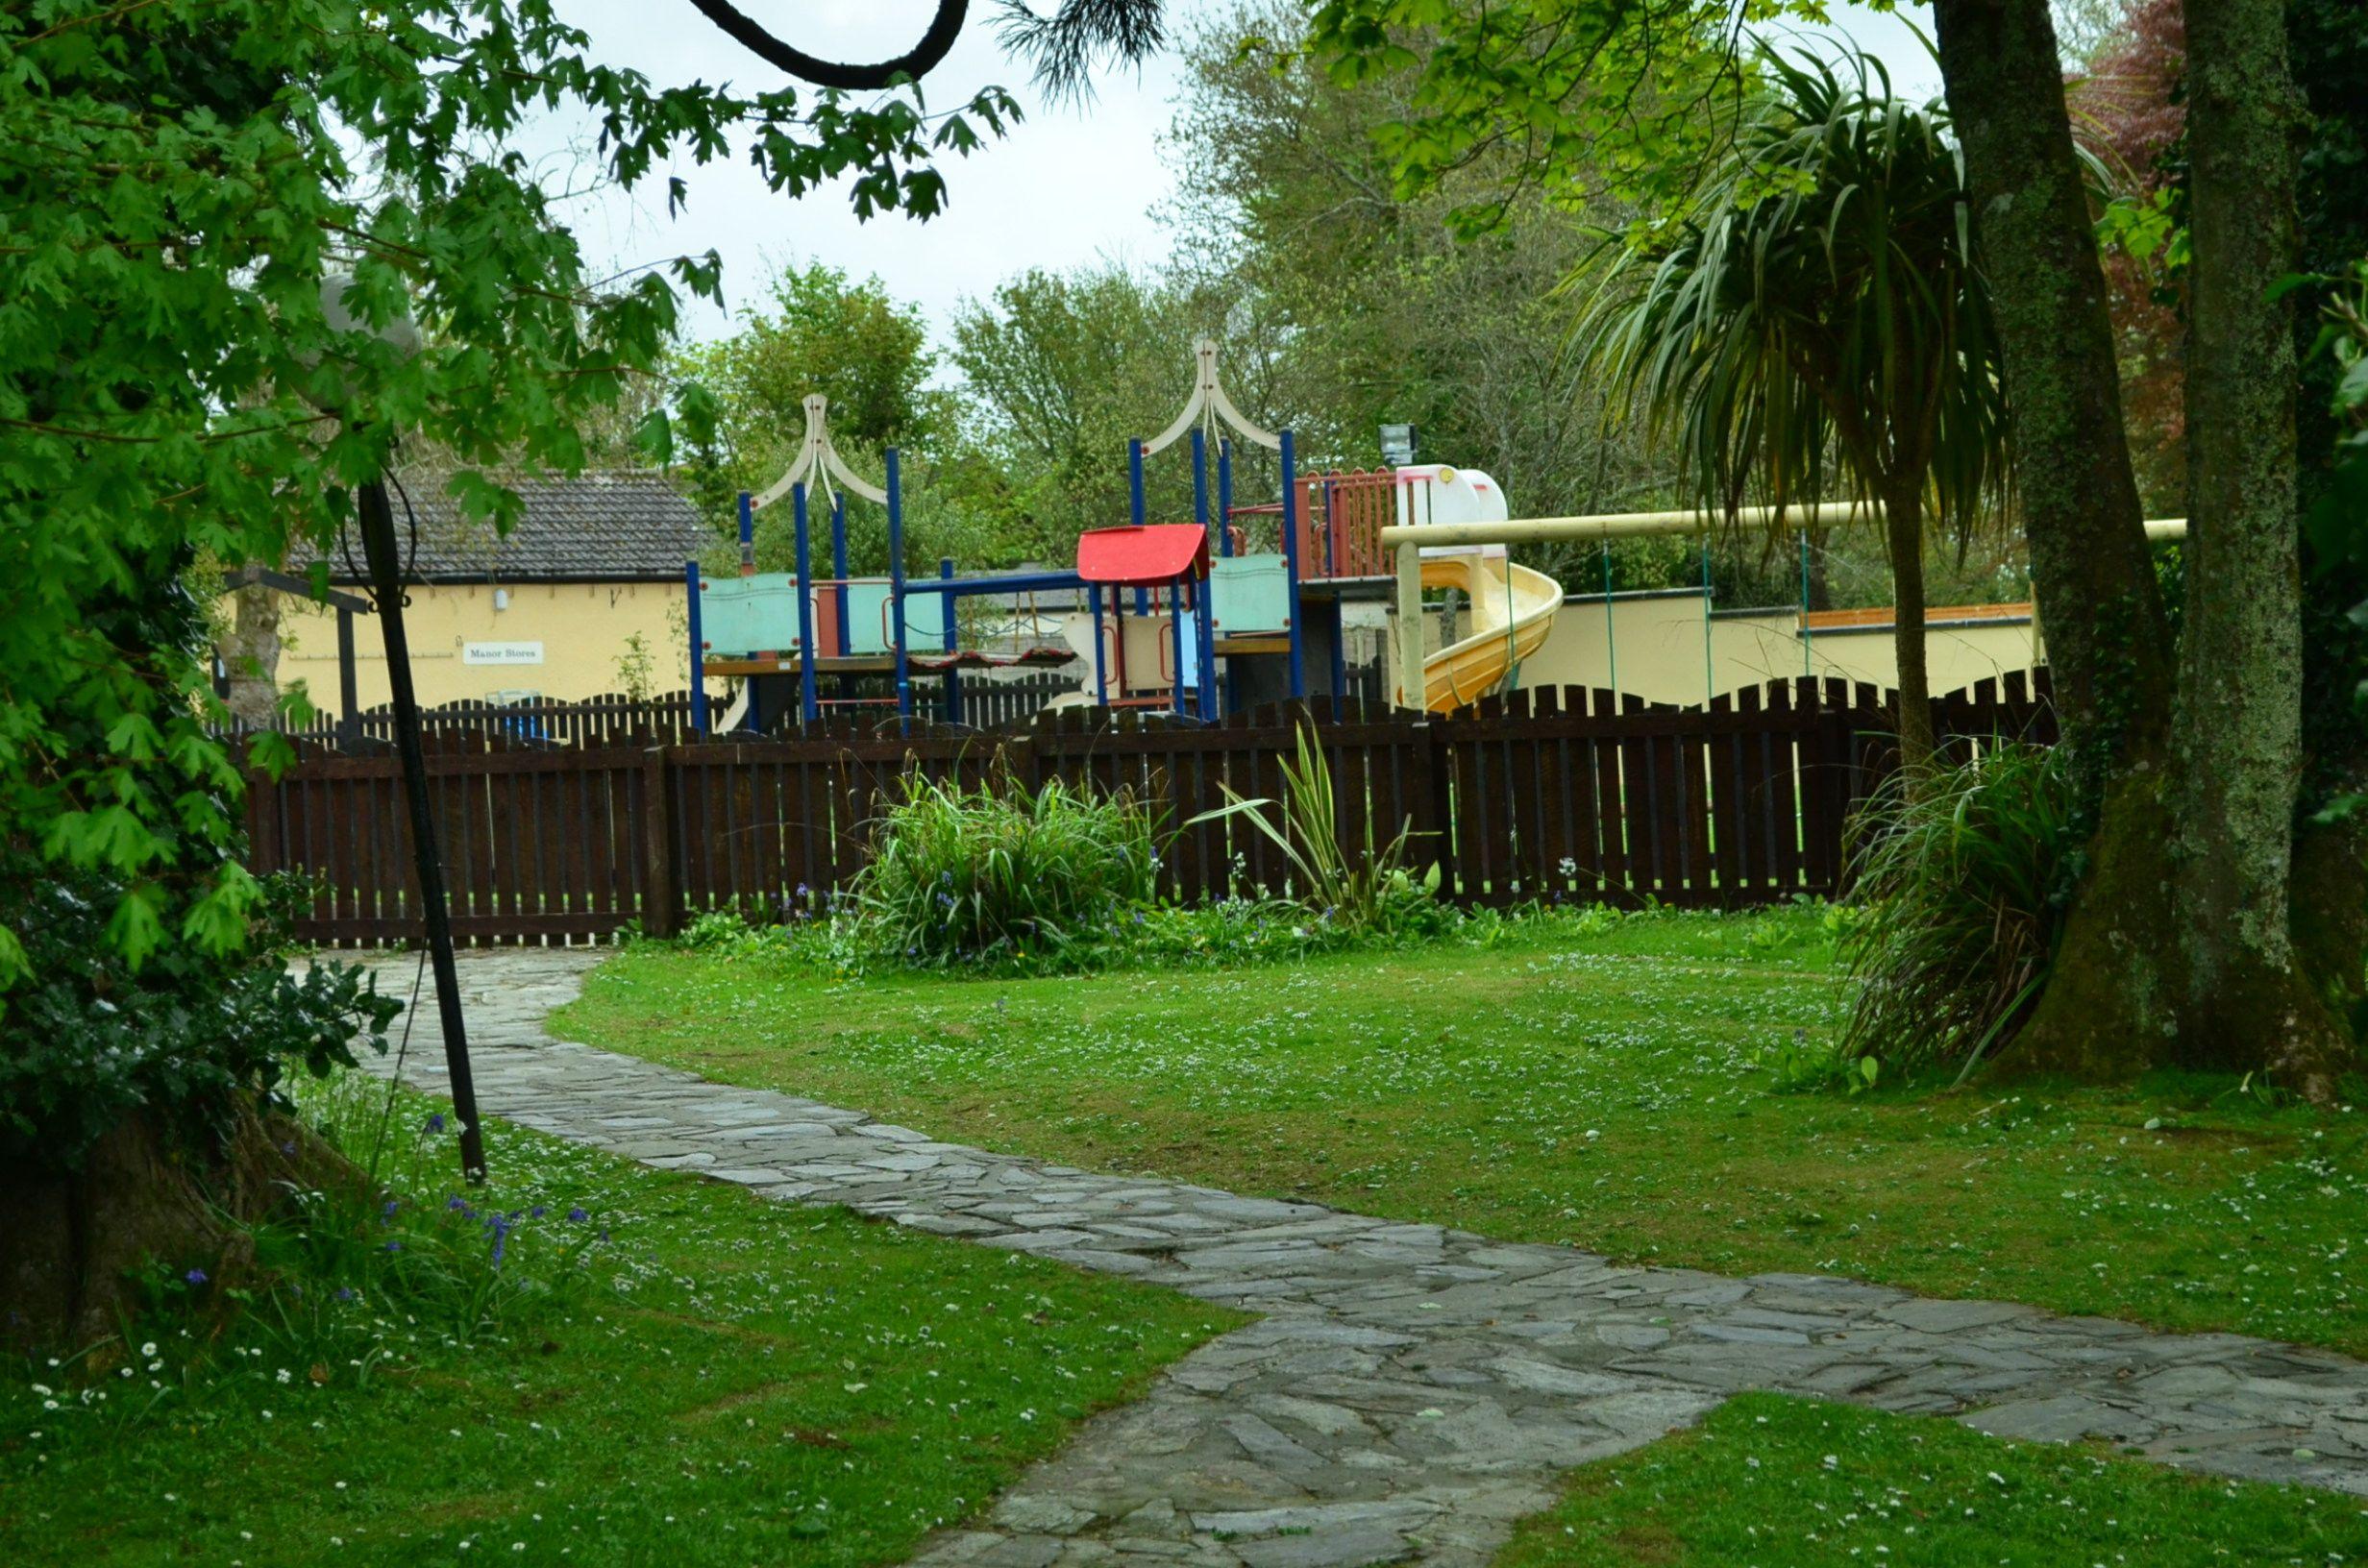 Playpark